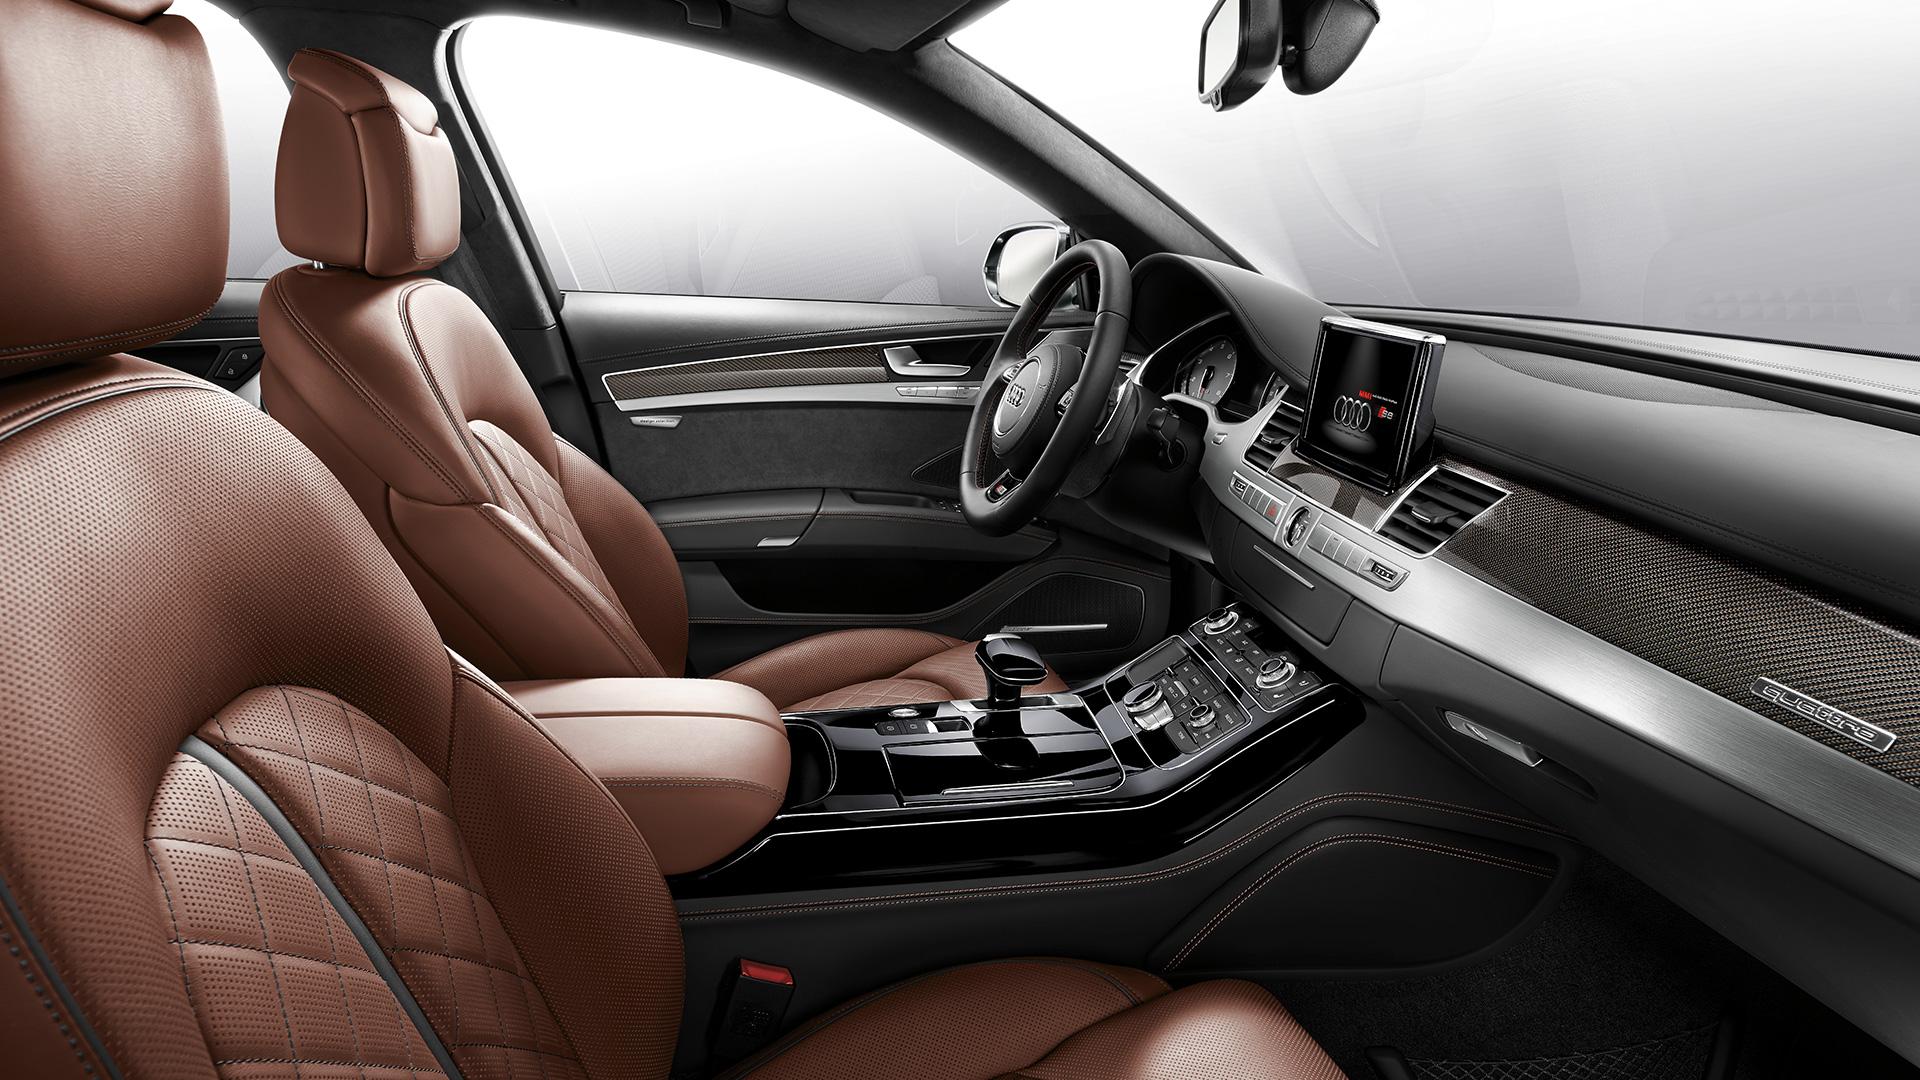 Audi A8 Interior >> AUDI S8 specs - 2013, 2014, 2015, 2016, 2017, 2018 - autoevolution